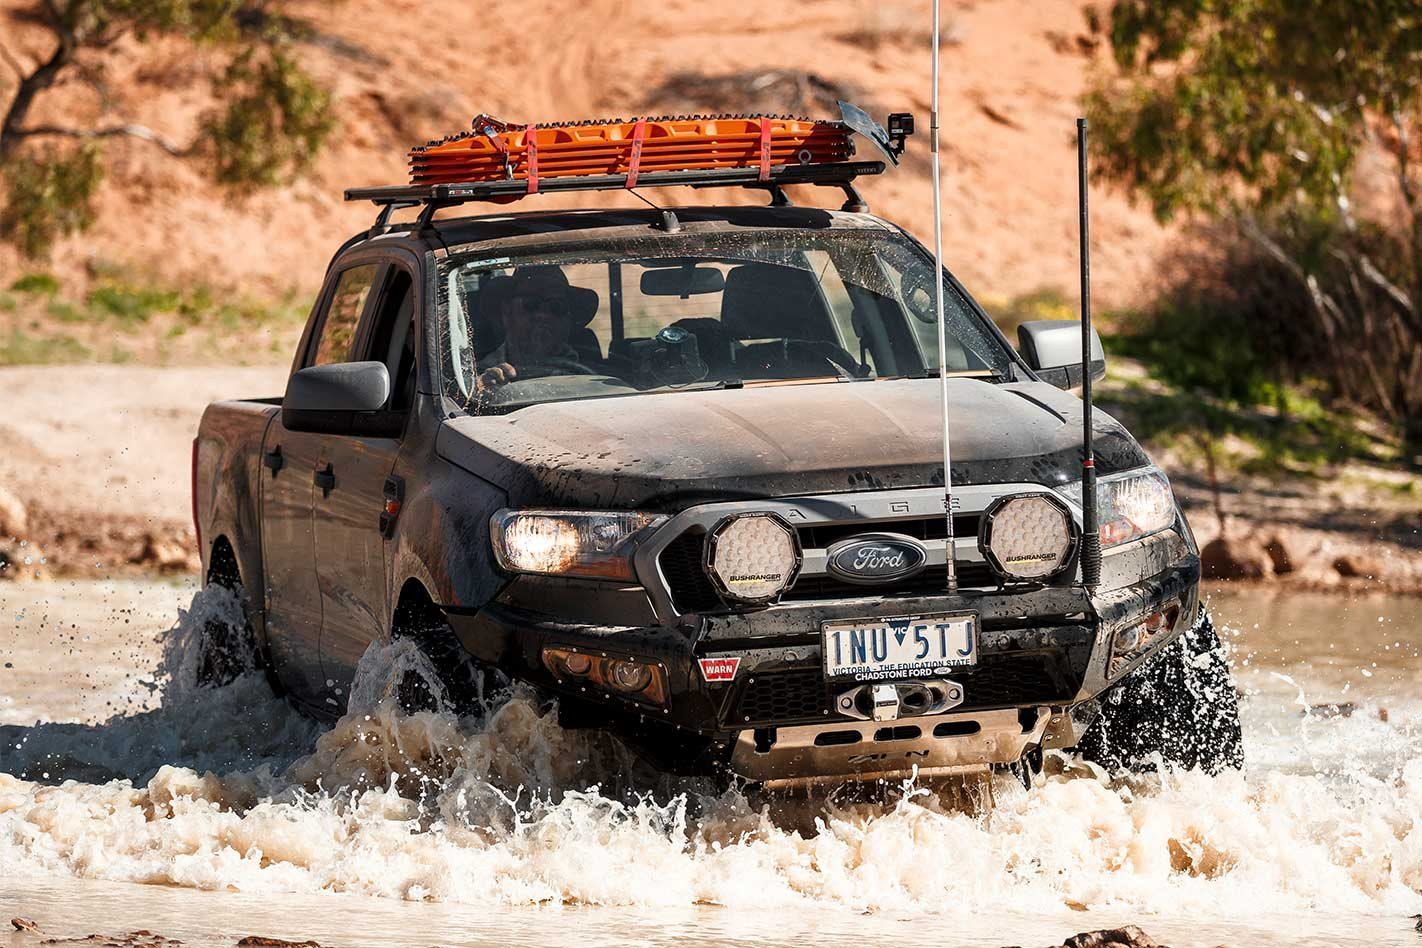 2018 Ford Ranger XLS long-termer hits the tracks: 4x4 shed